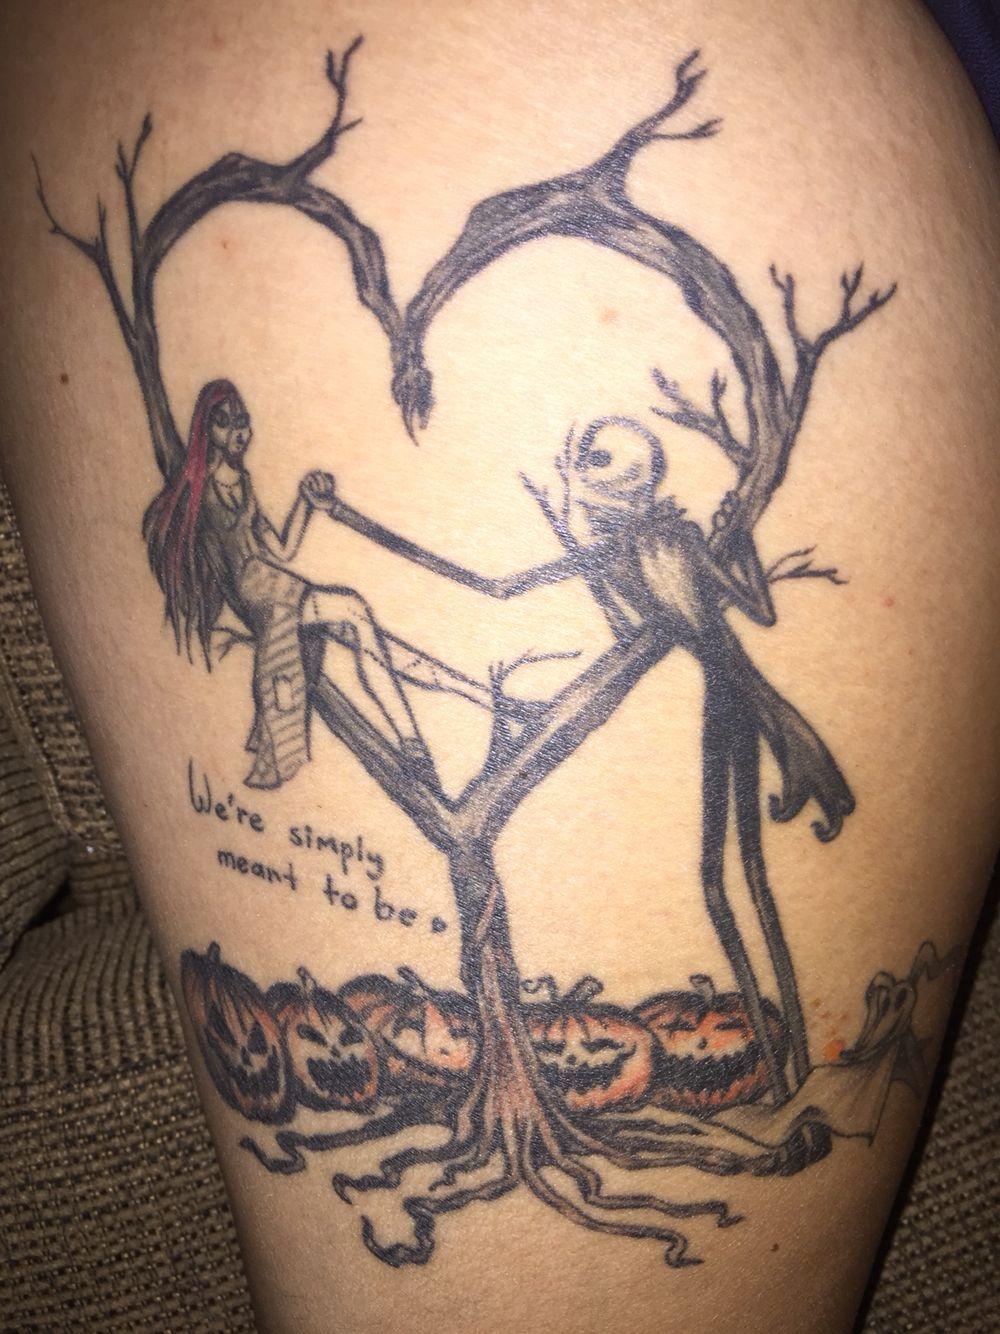 My personal Nightmare before Christmas tattoo | Tattoos | Pinterest ...